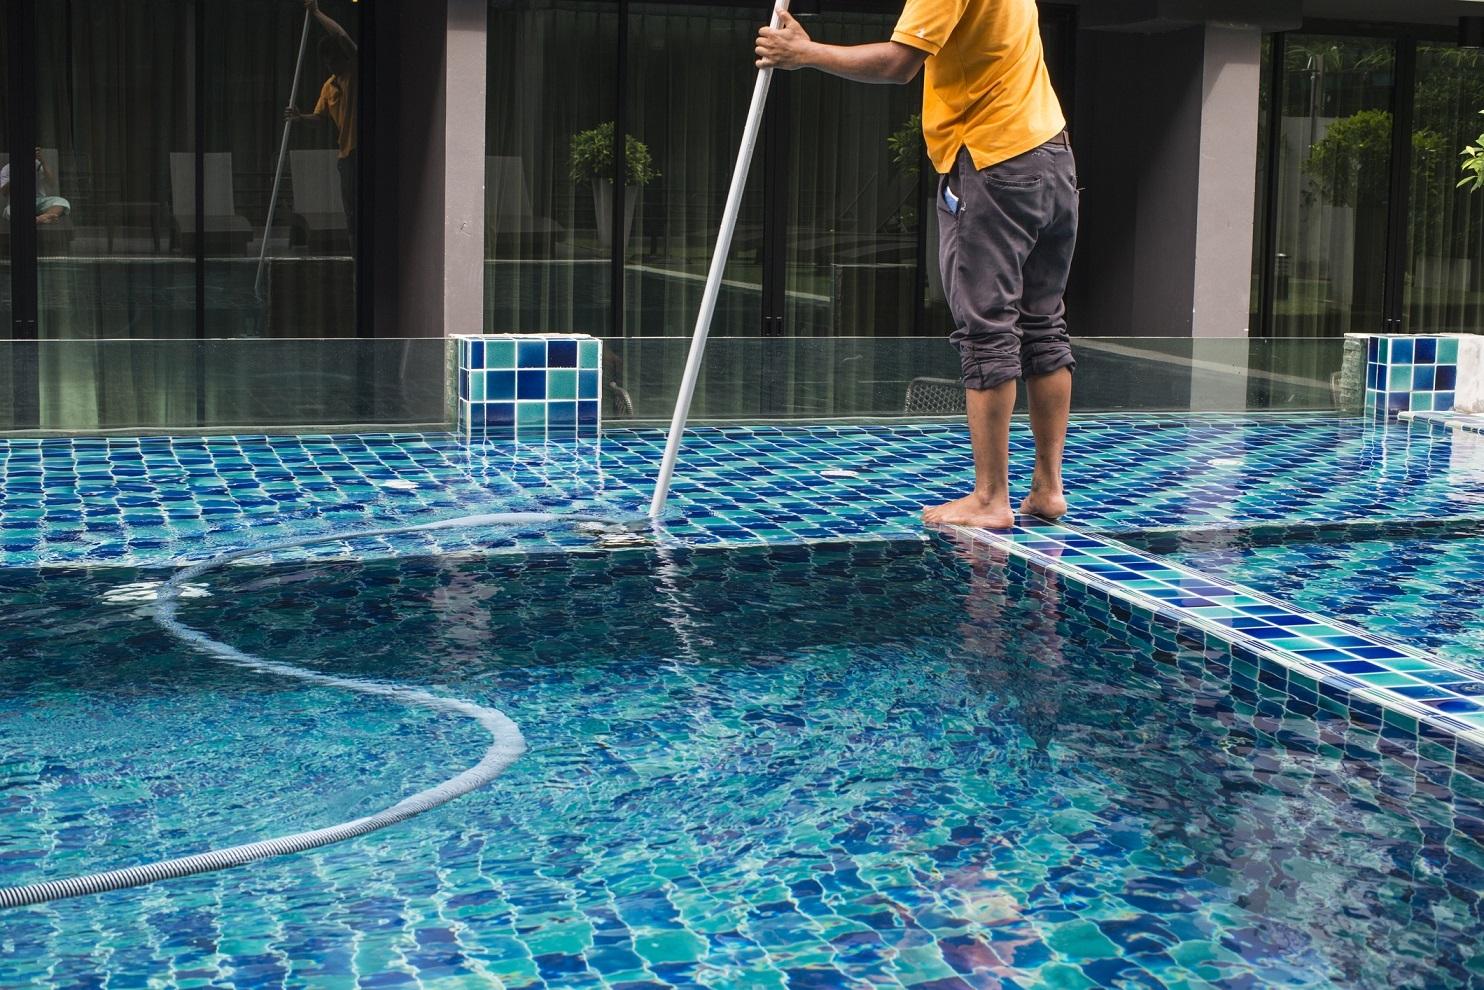 Man cleans a pool